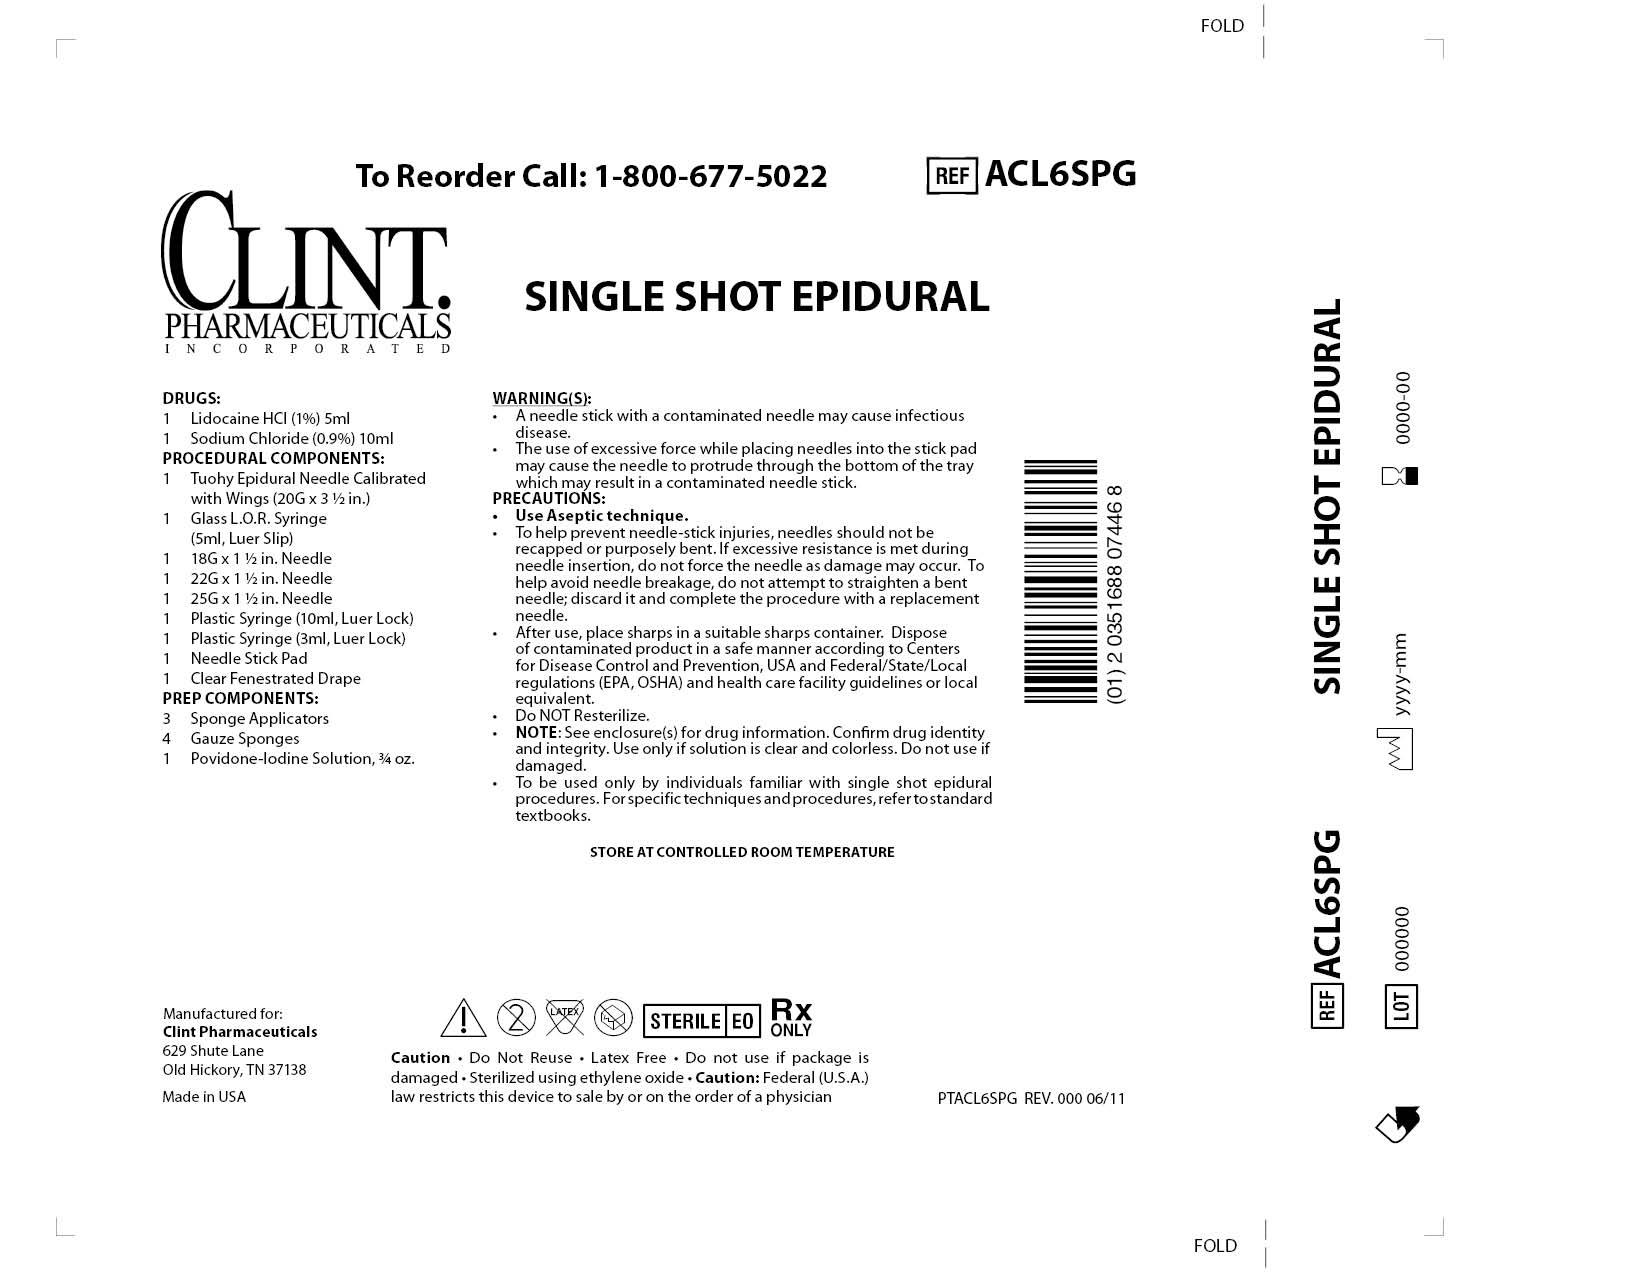 Acl6spg Single Shot Epidural () Kit [Clint Pharmaceuticals, Inc.]